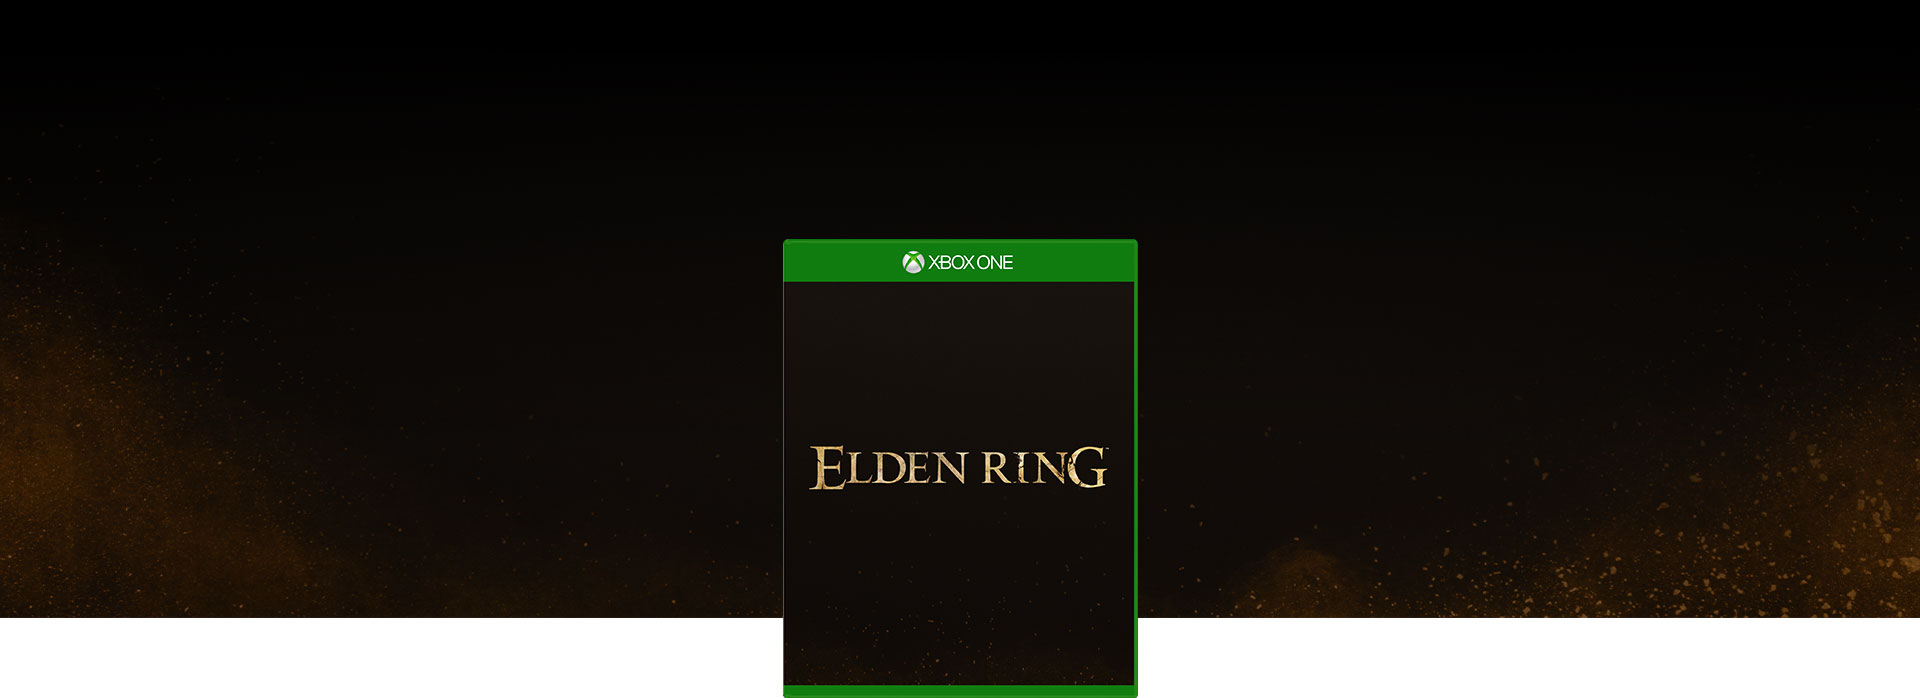 Elden Ring 的包裝圖與深淺棕色亮點消失在黑暗中